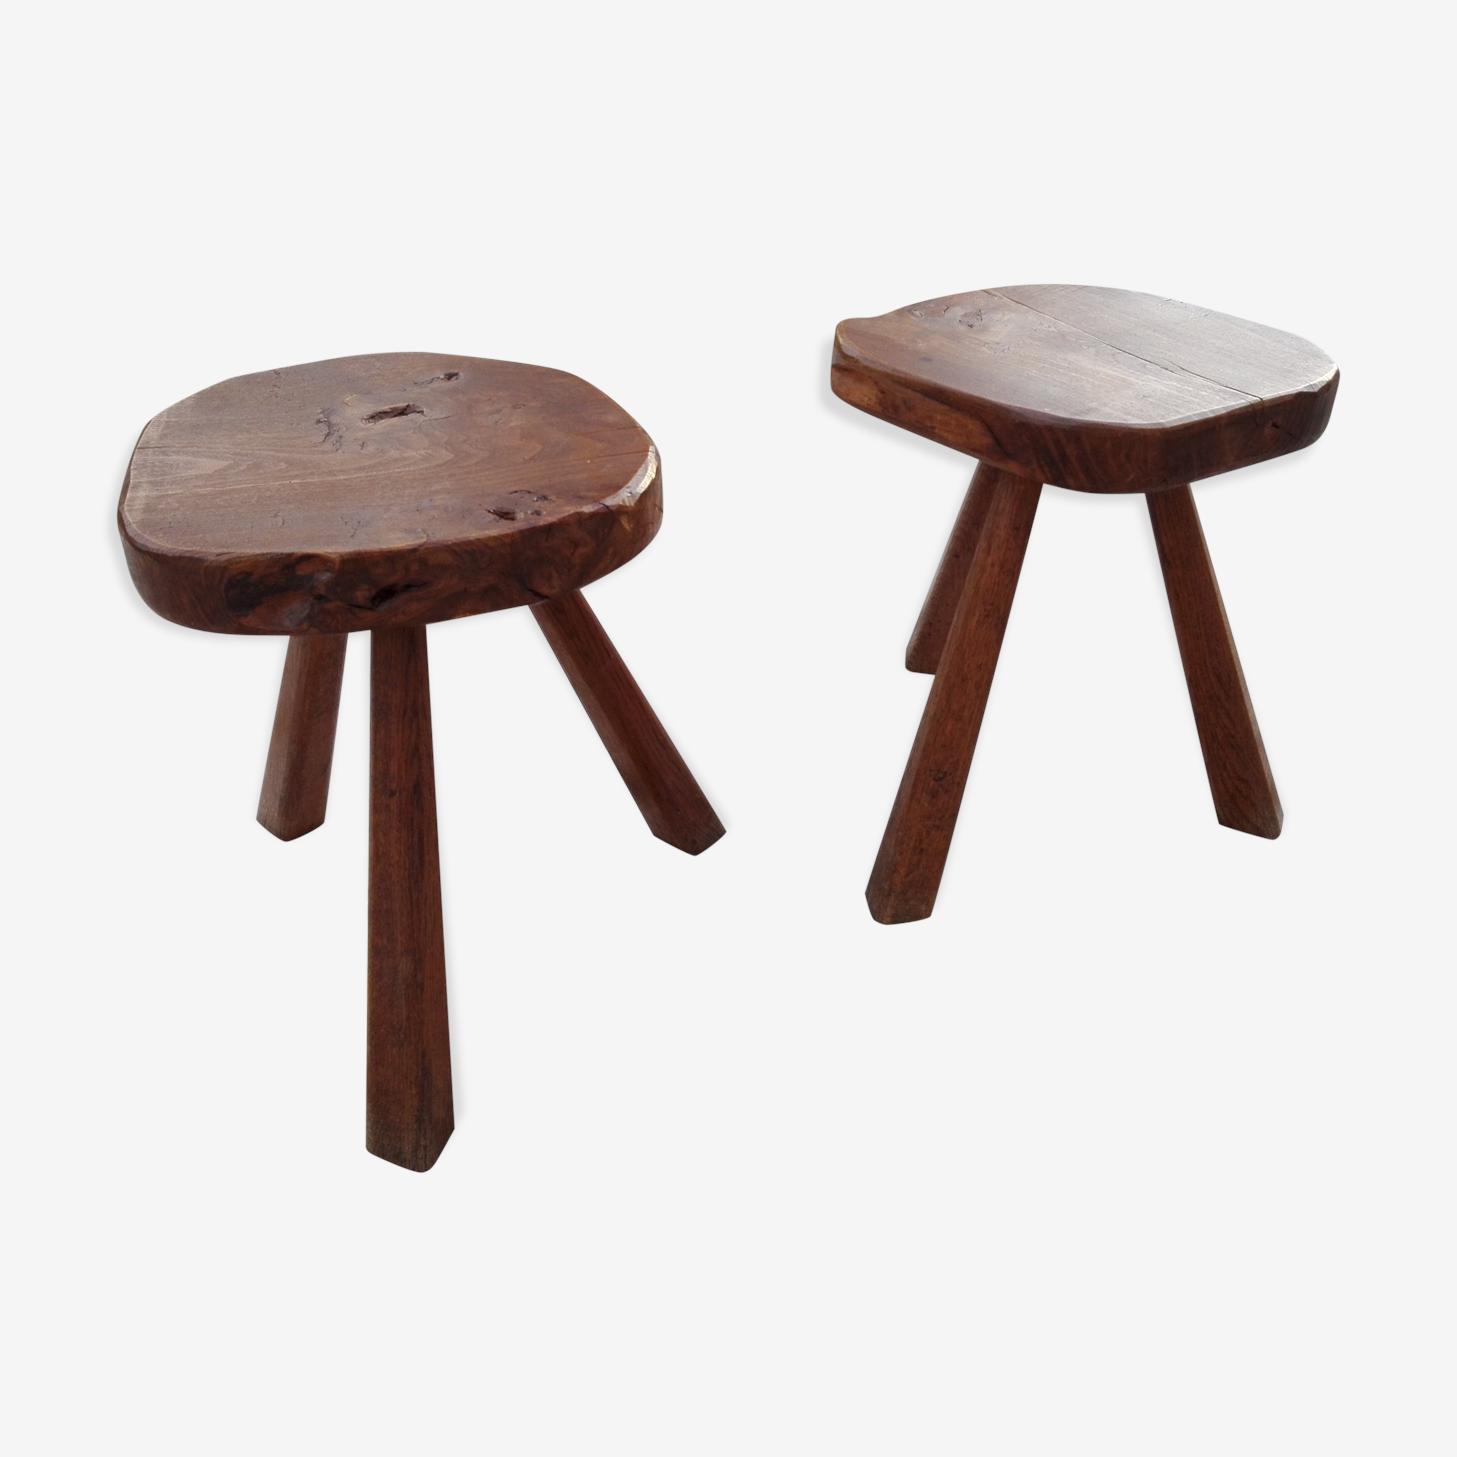 Lot of 2 stools